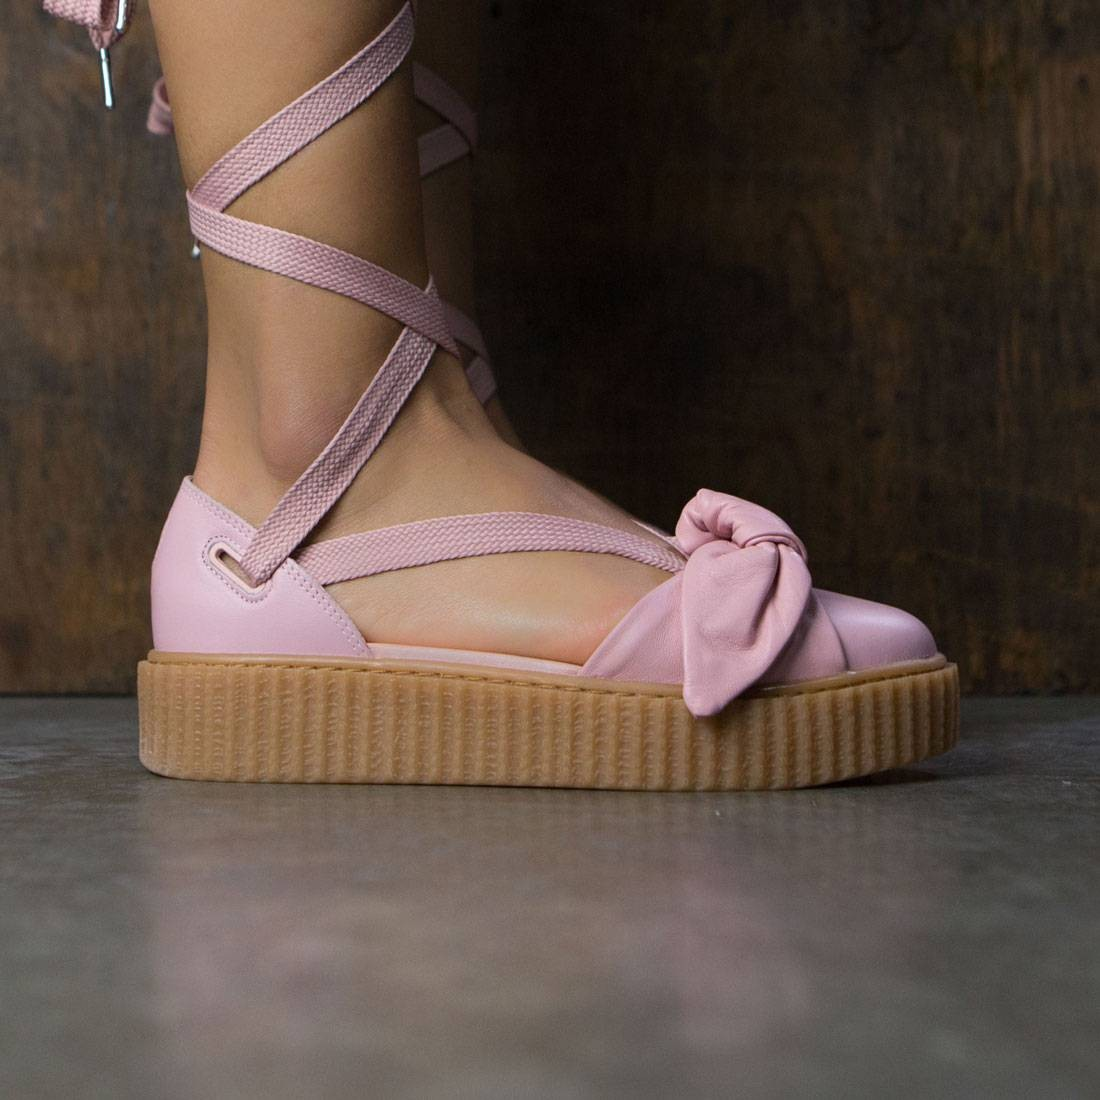 buy online ff101 5e136 Puma x Fenty By Rihanna Women Bow Creeper Sandal (silver / pink / oatmeal)